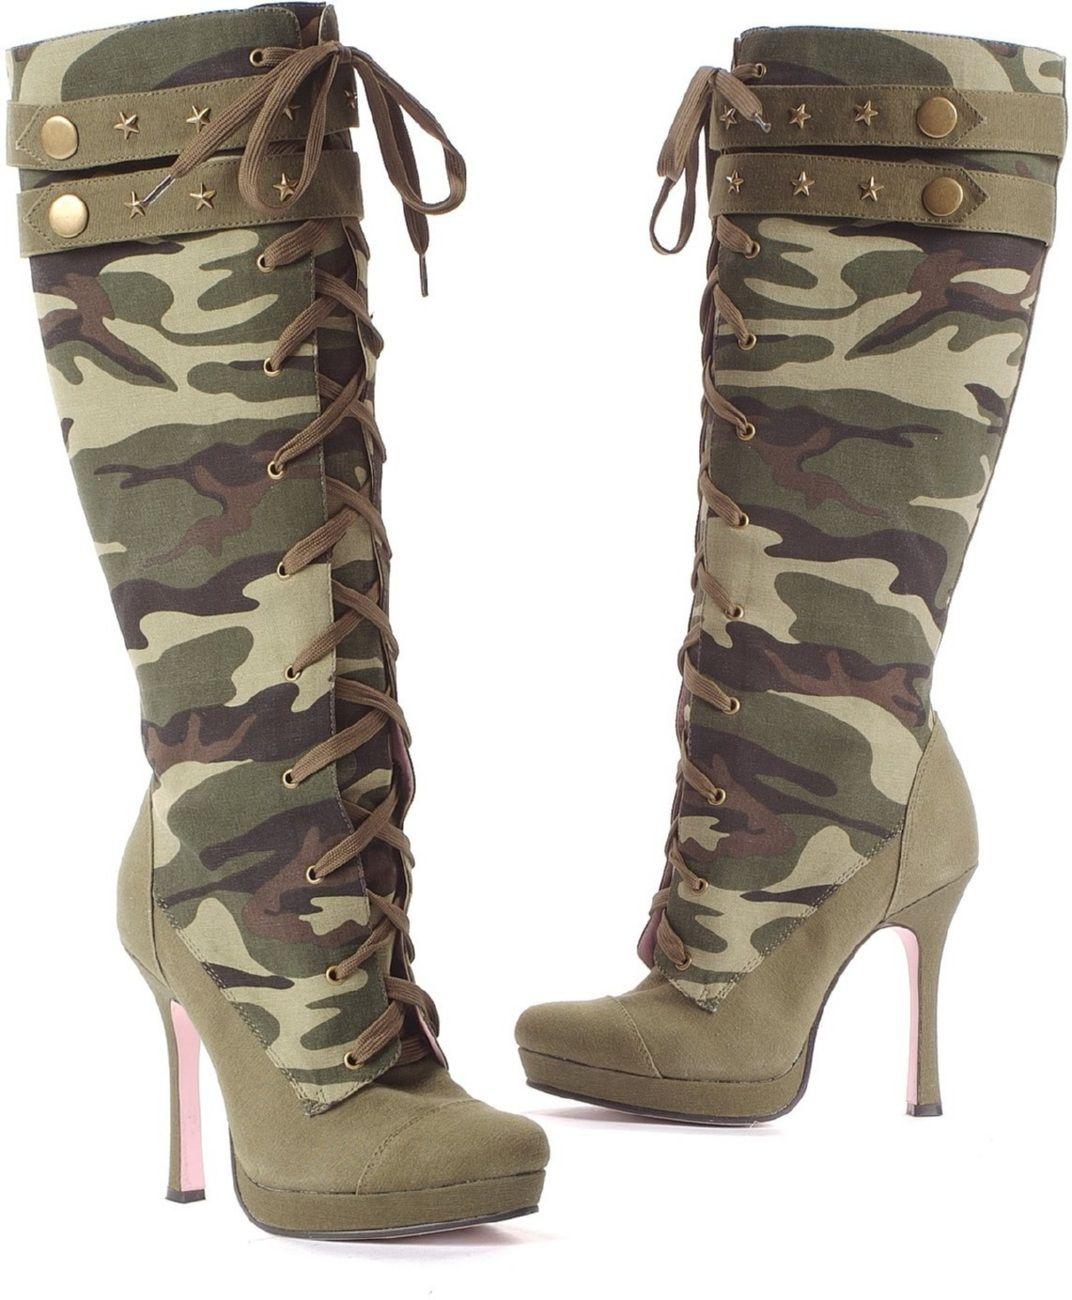 f527bfabceb Camo High Heel Boots Keywords: #weddings #jevelweddingplanning ...